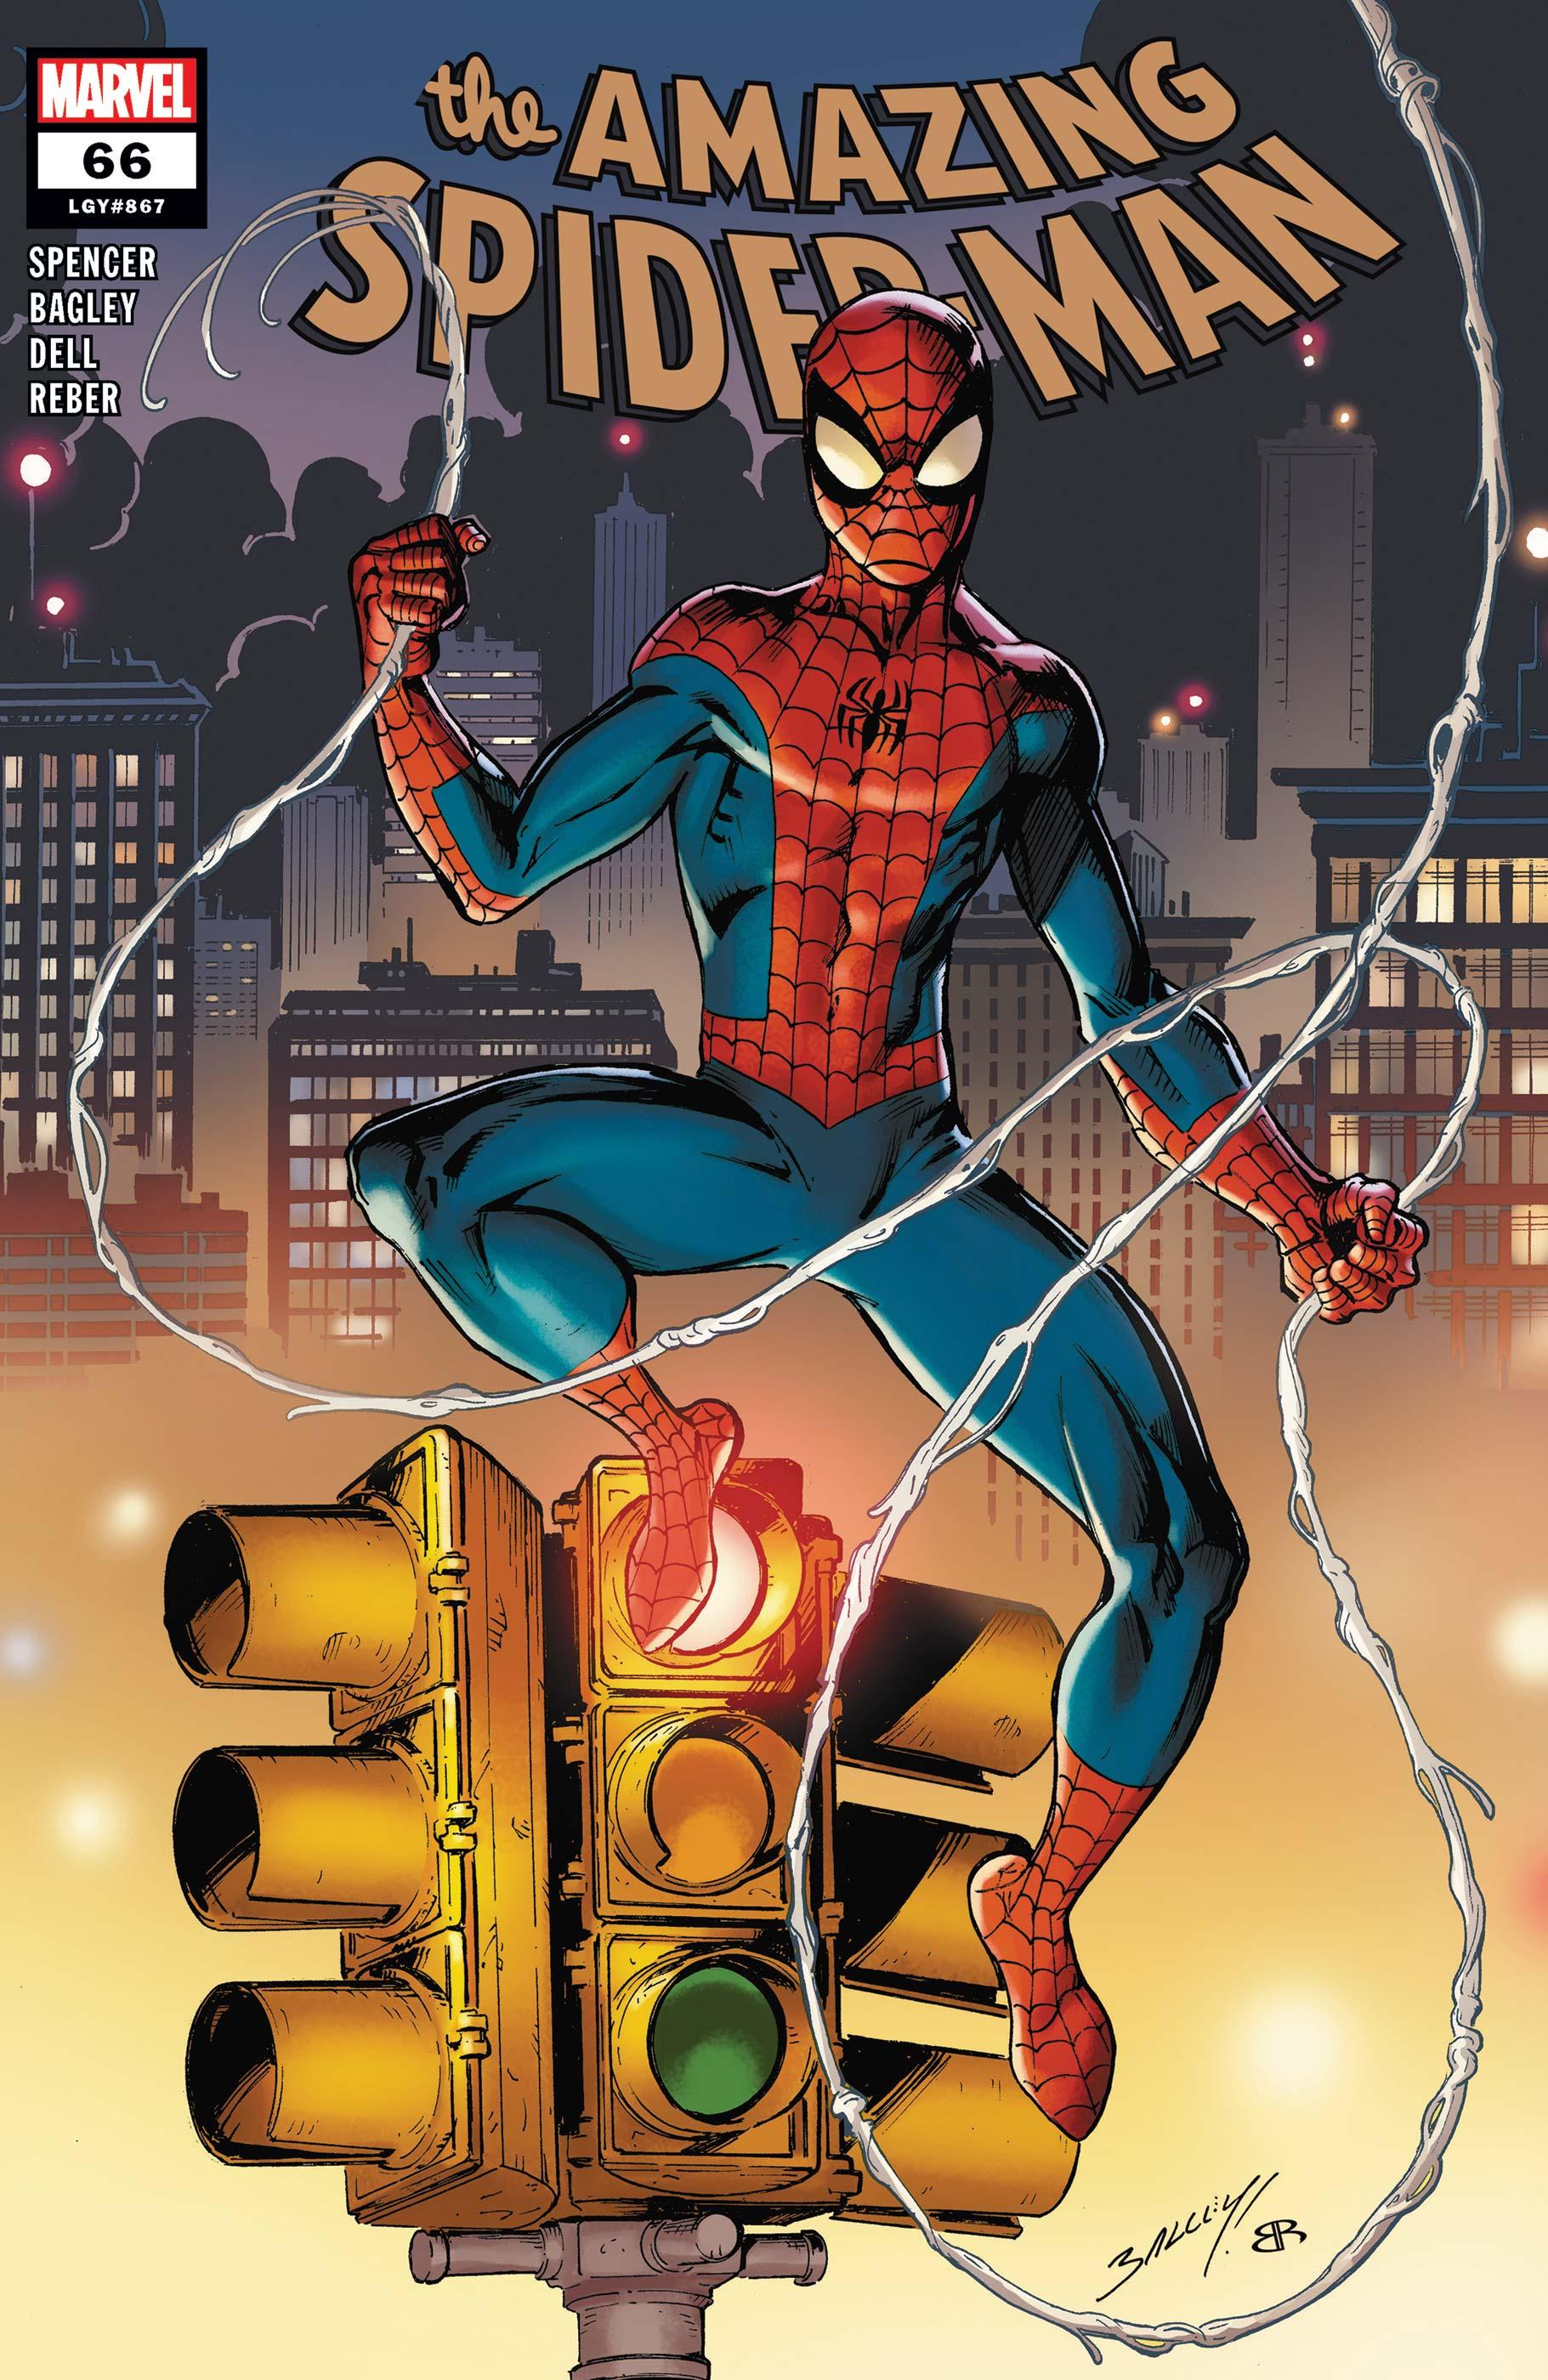 The Amazing Spider-Man (2018) #66